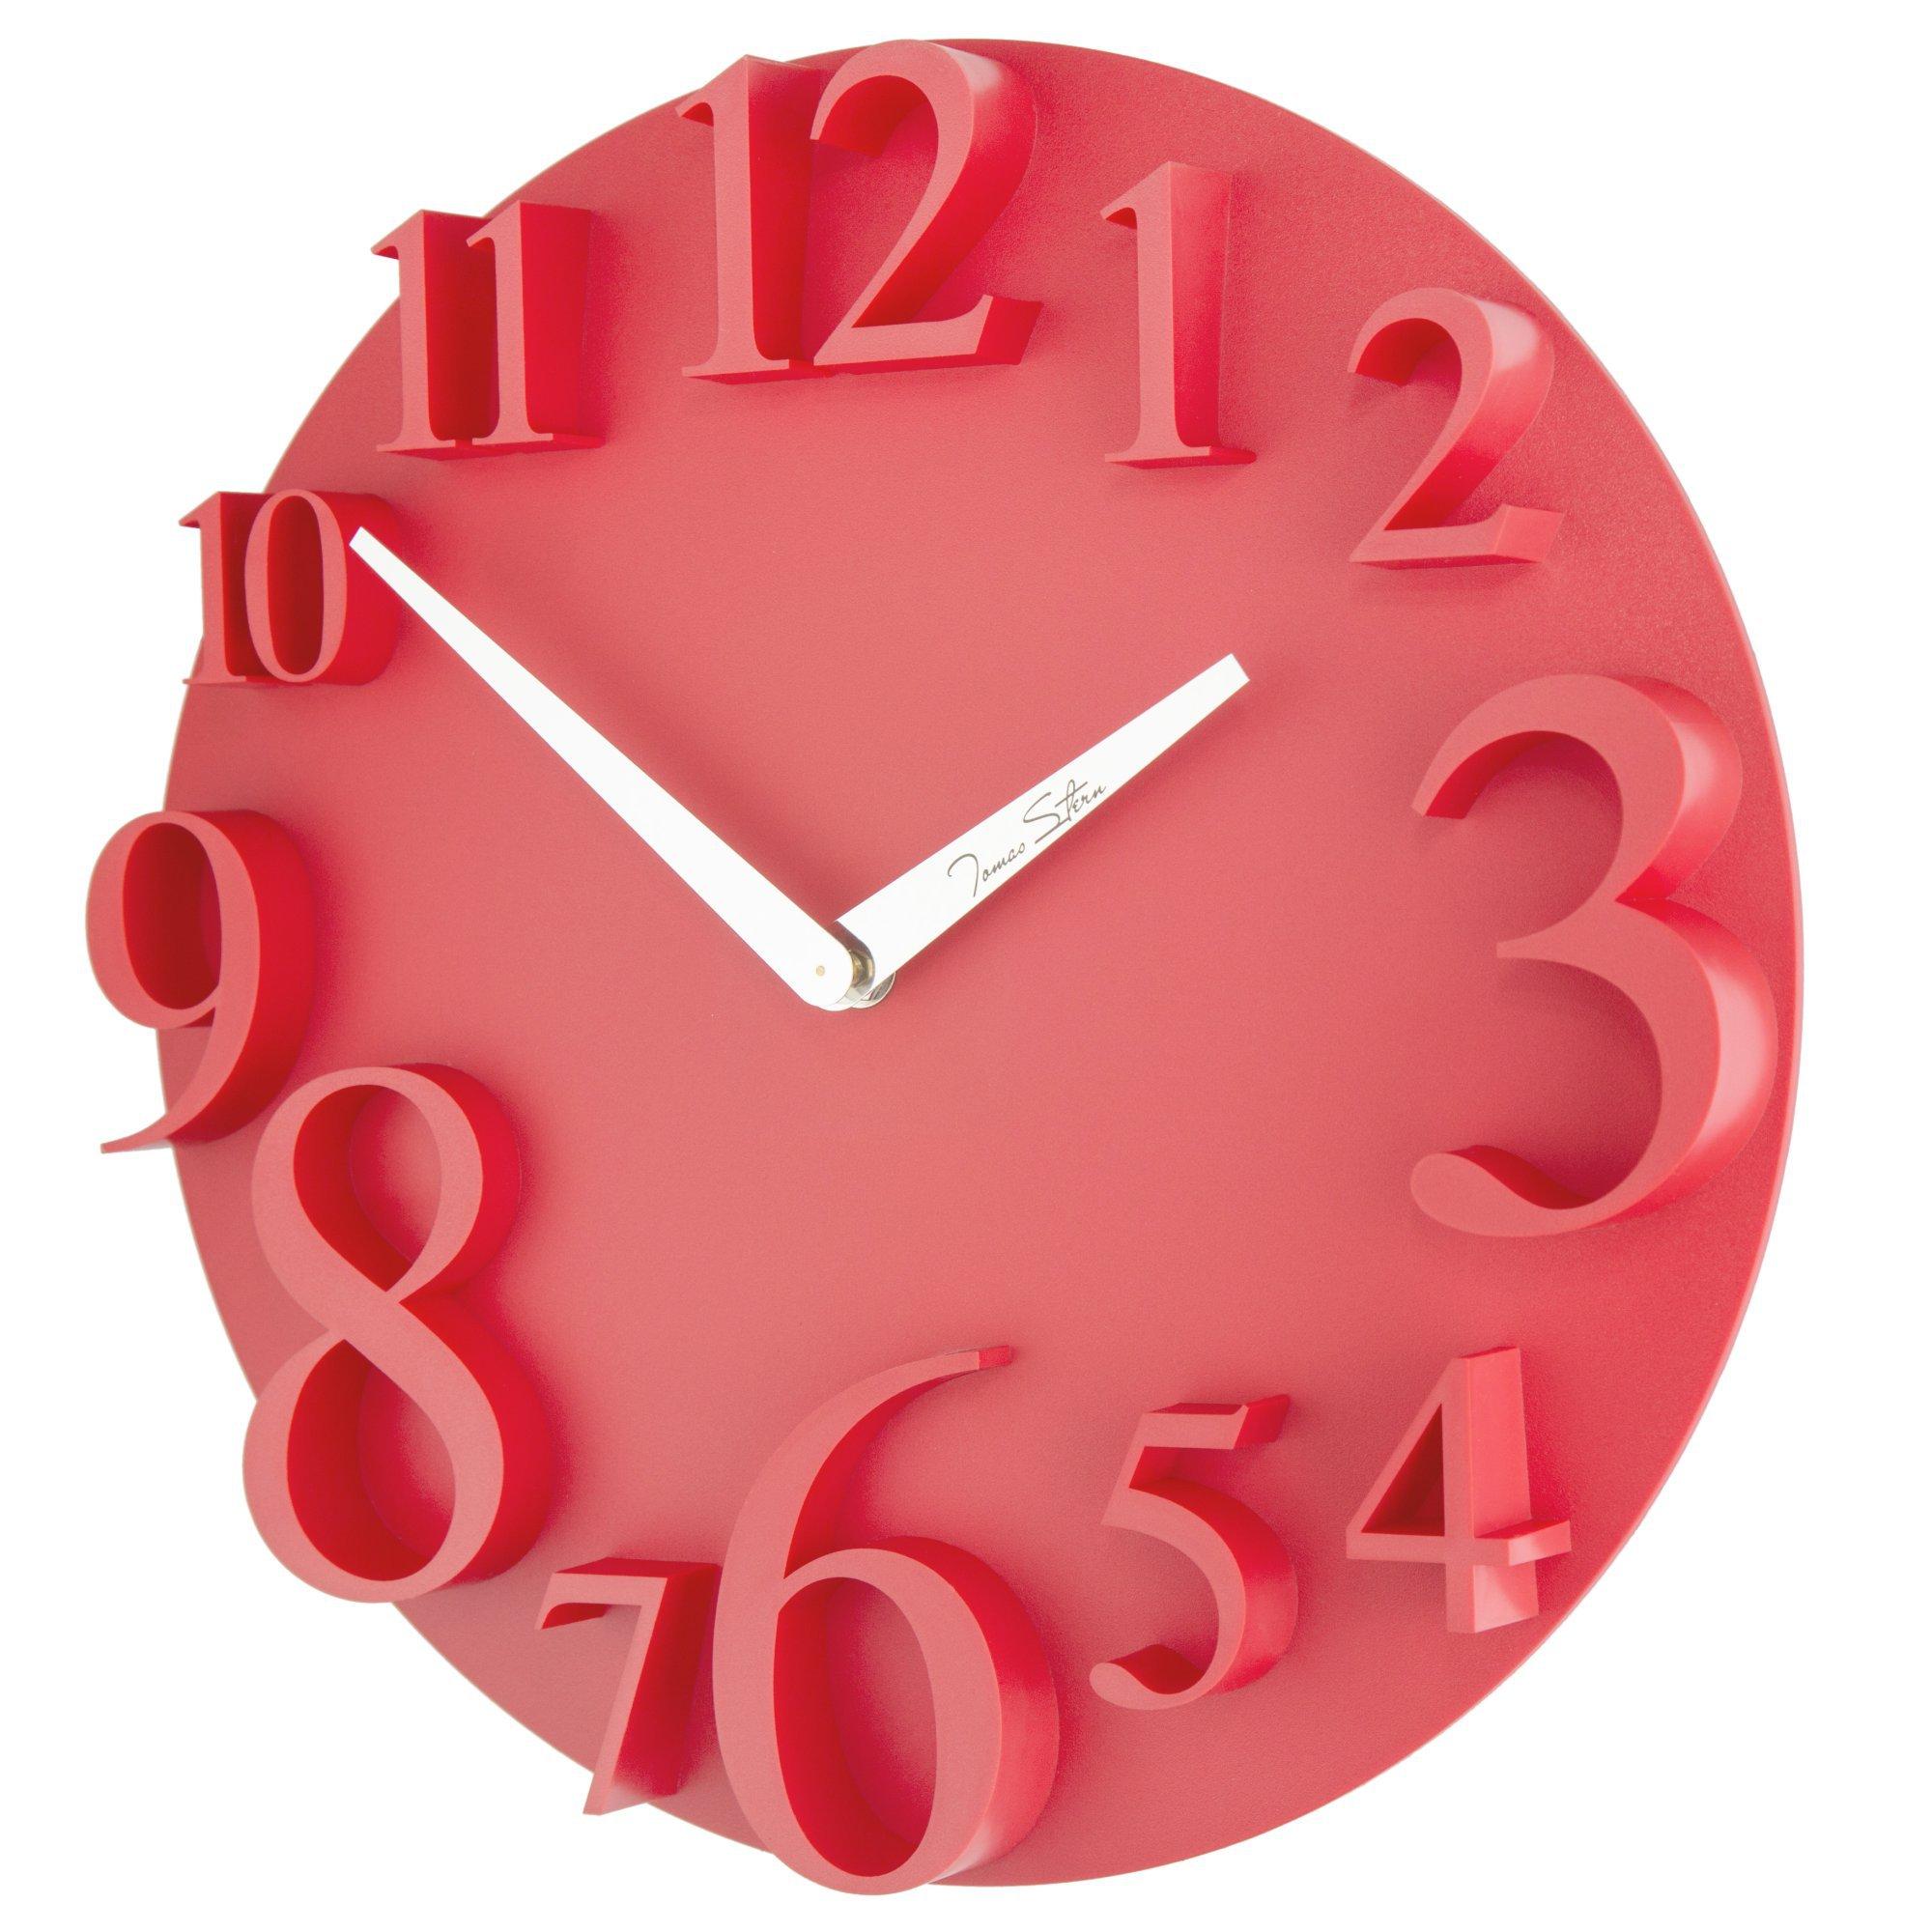 Часы настенные Часы настенные Tomas Stern 4023R chasy-nastennye-tomas-stern-4023r-germaniya.jpg